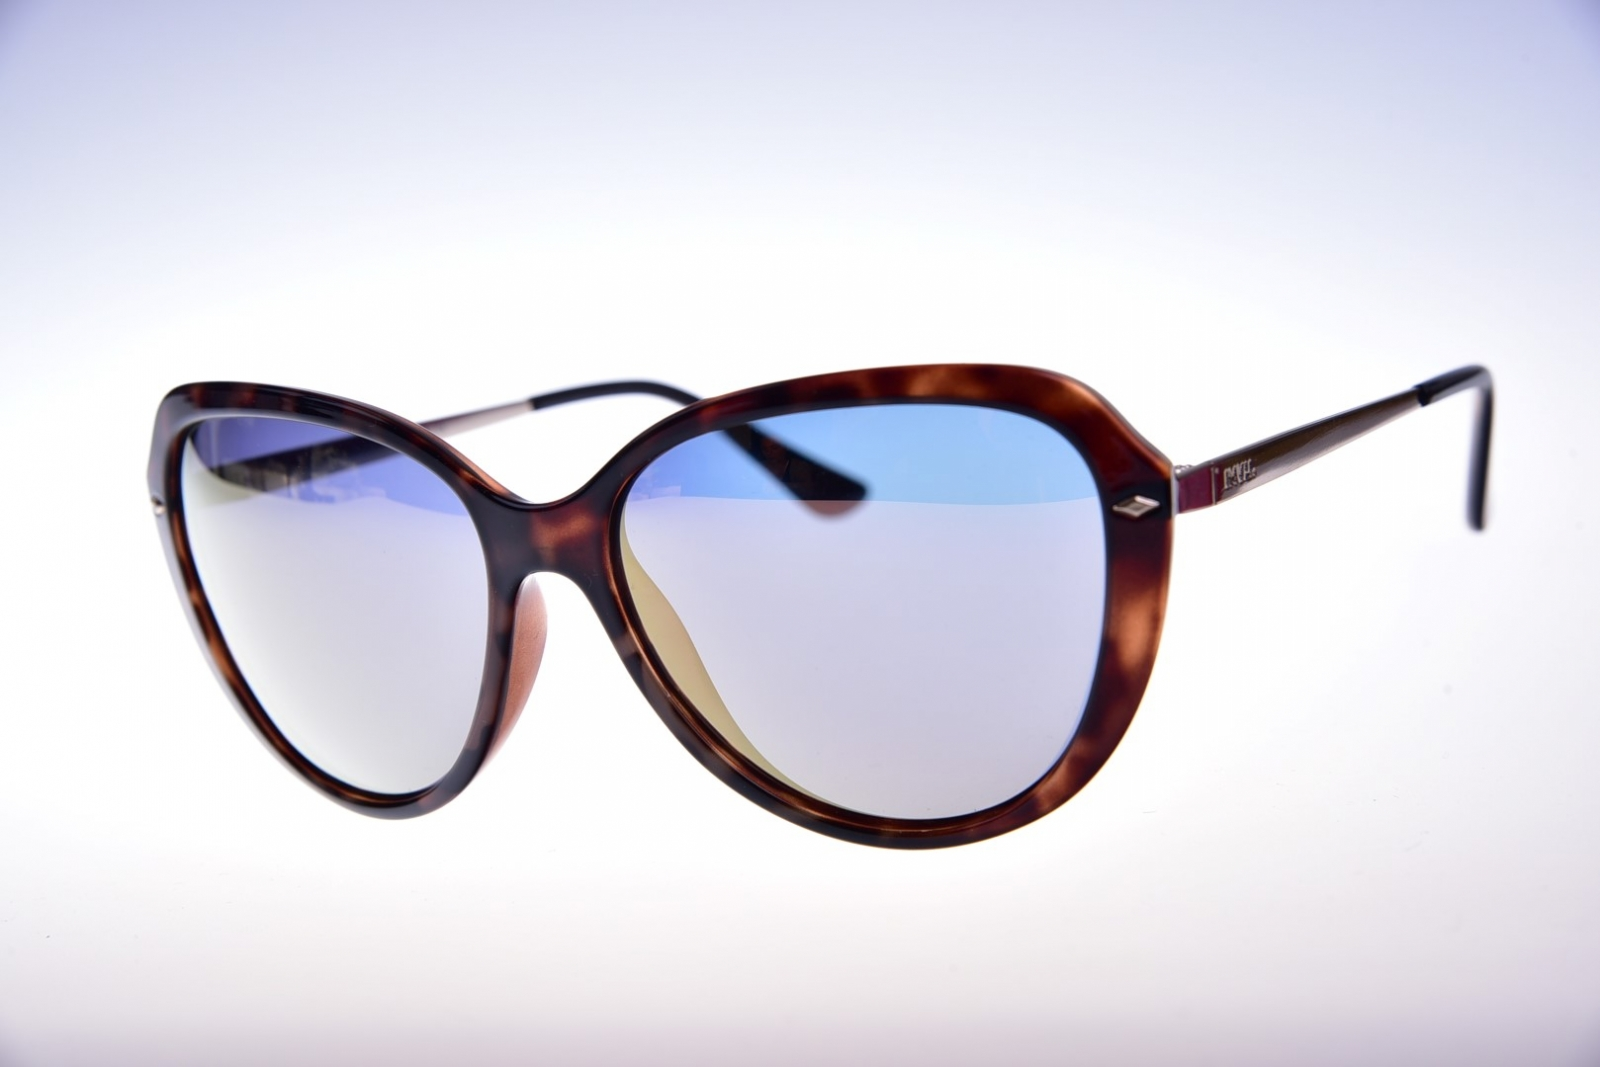 INVU. Classic B2728C - Dámske slnečné okuliare